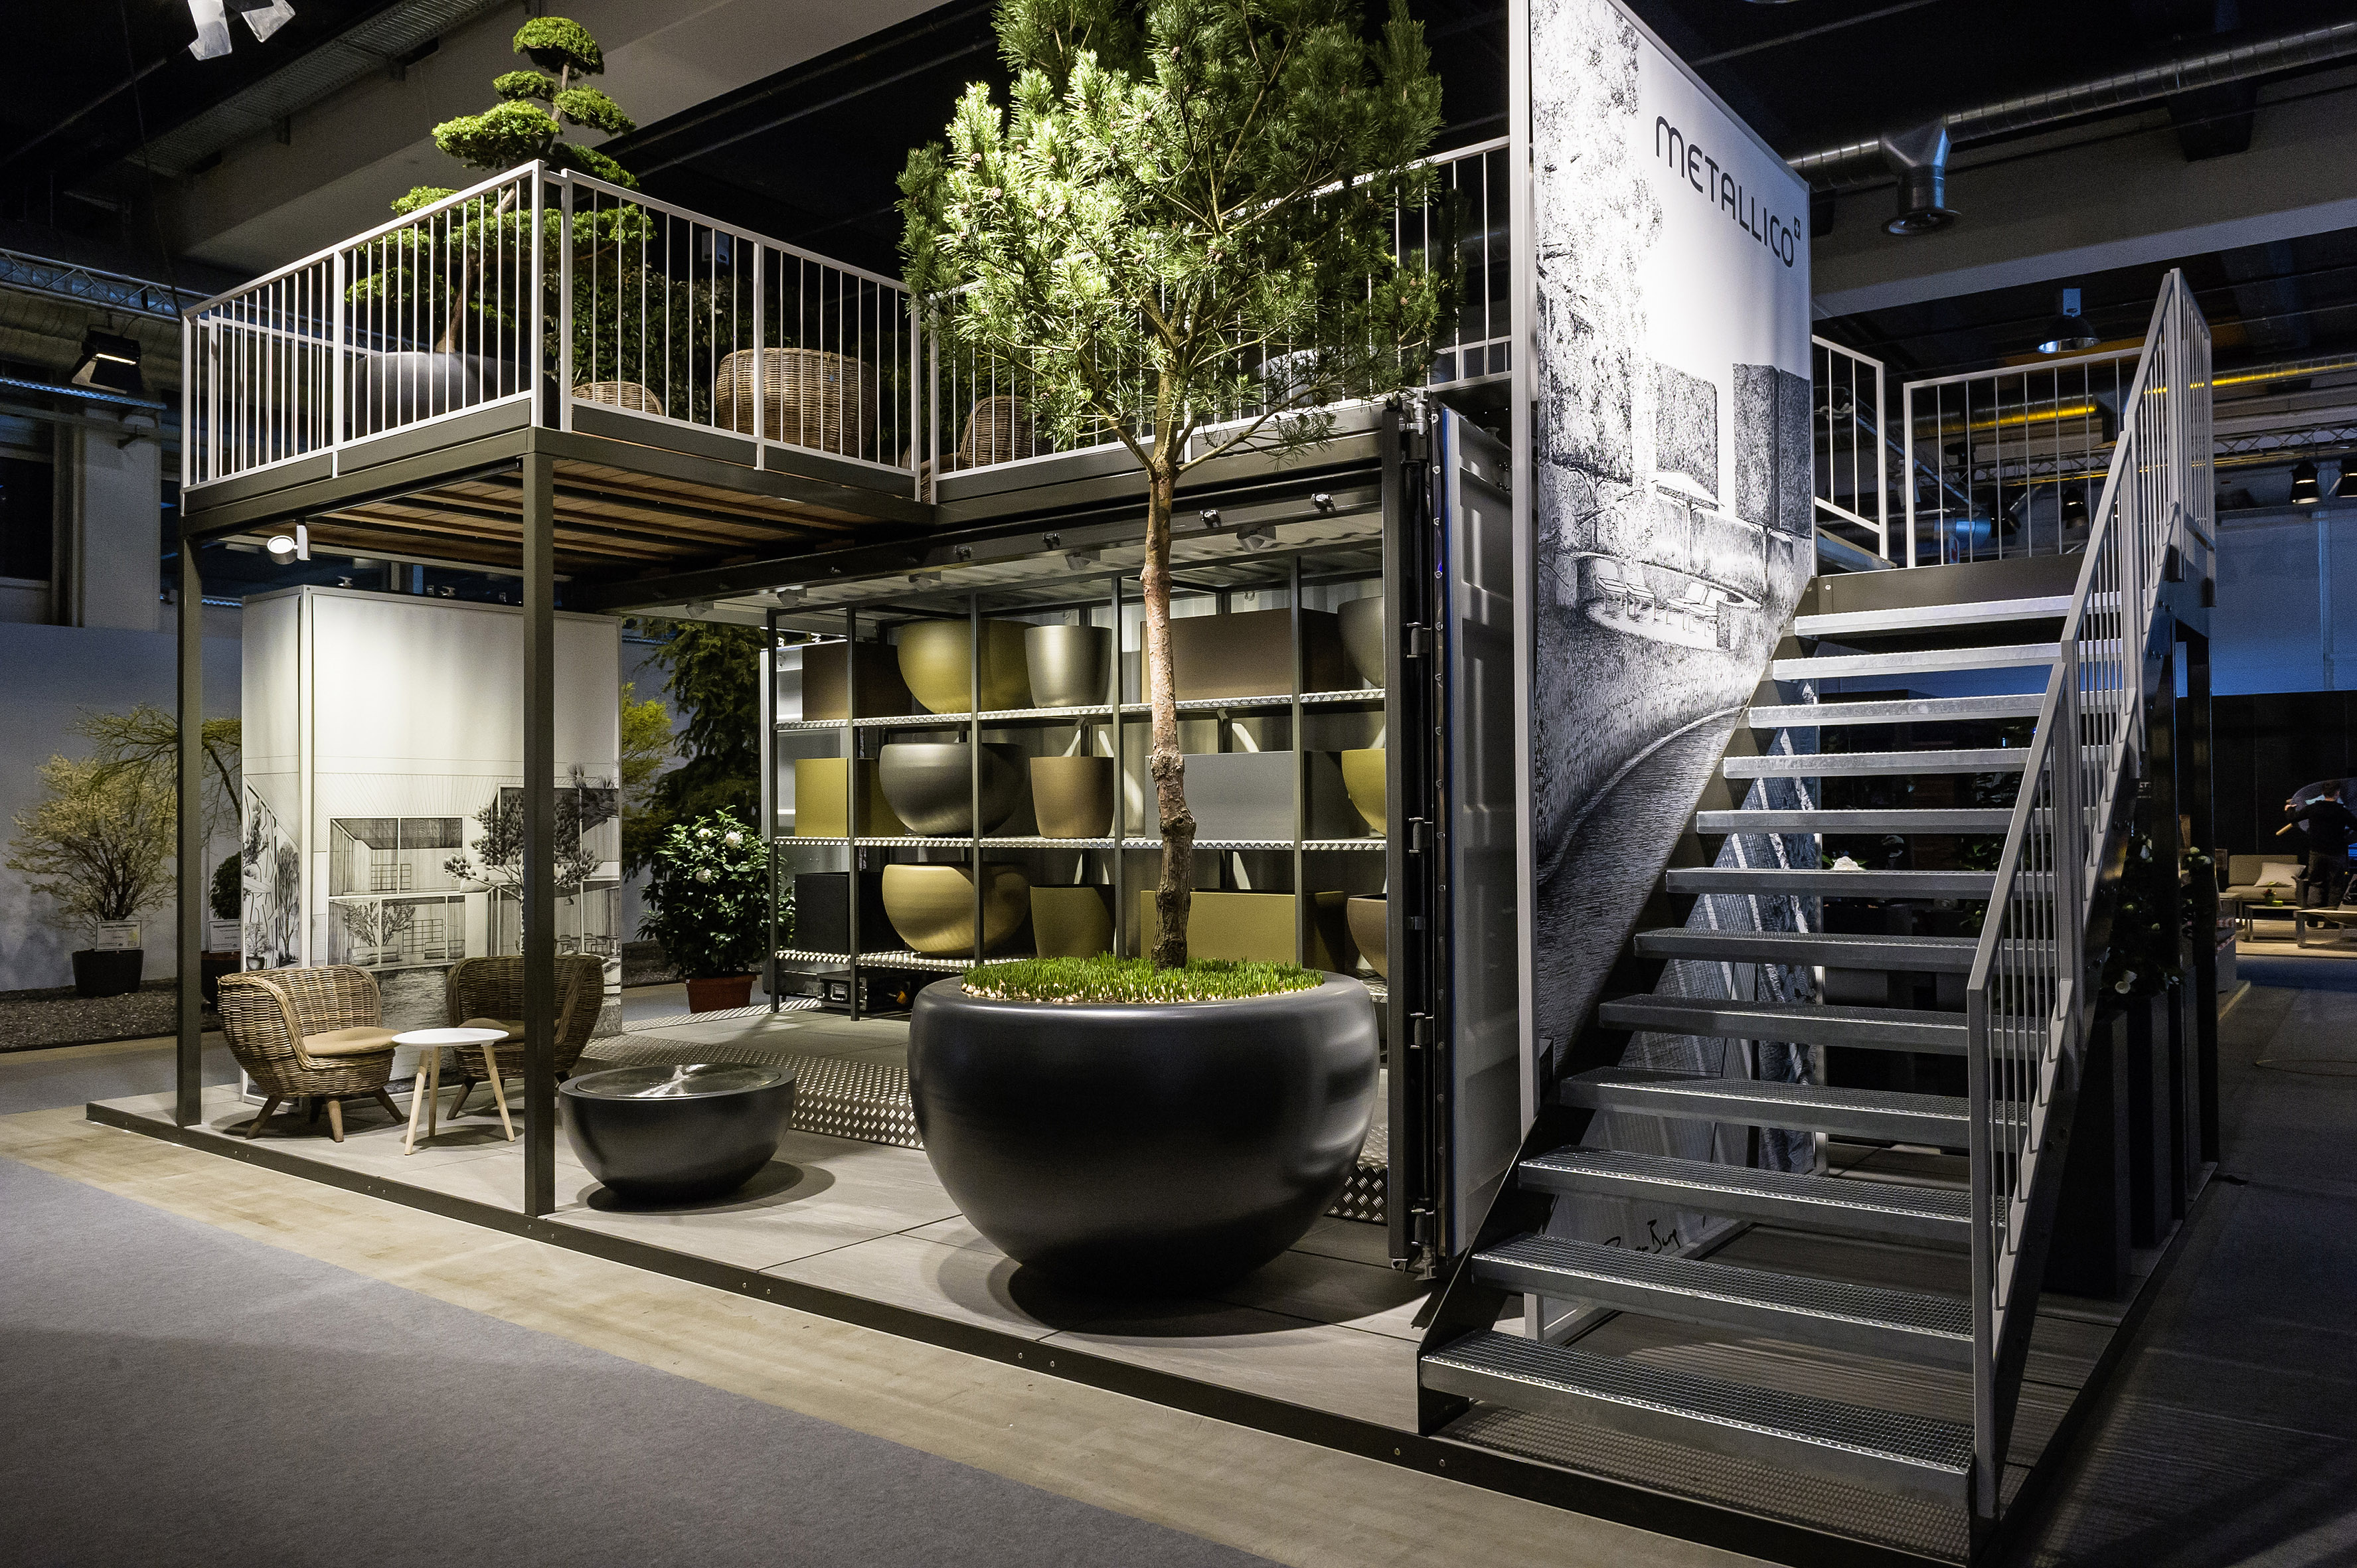 Giardina 2016 | GiardinaAWARD | Award Verleihung | GiardinaSTYLE | Staende bis 40 m2 | Metallico by BECK | GiardinaAWARD Gewinner | Kategorie Gold